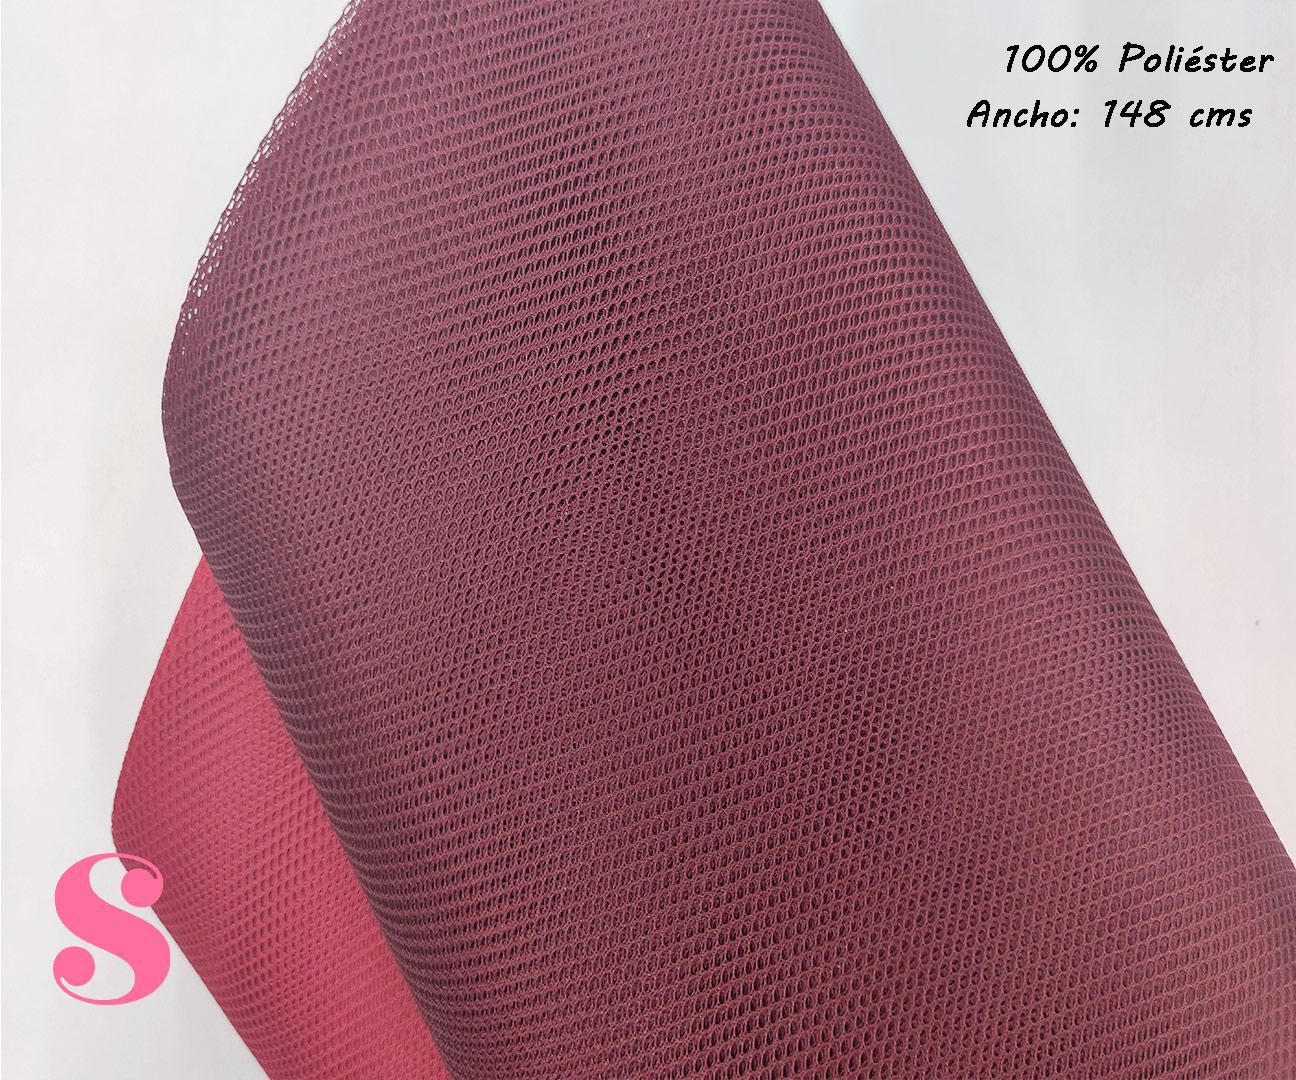 R4-granate-tela-de-rejlla-malla-poliester-facilidad-de-coser,Tela Mesh de Rejilla Rojo